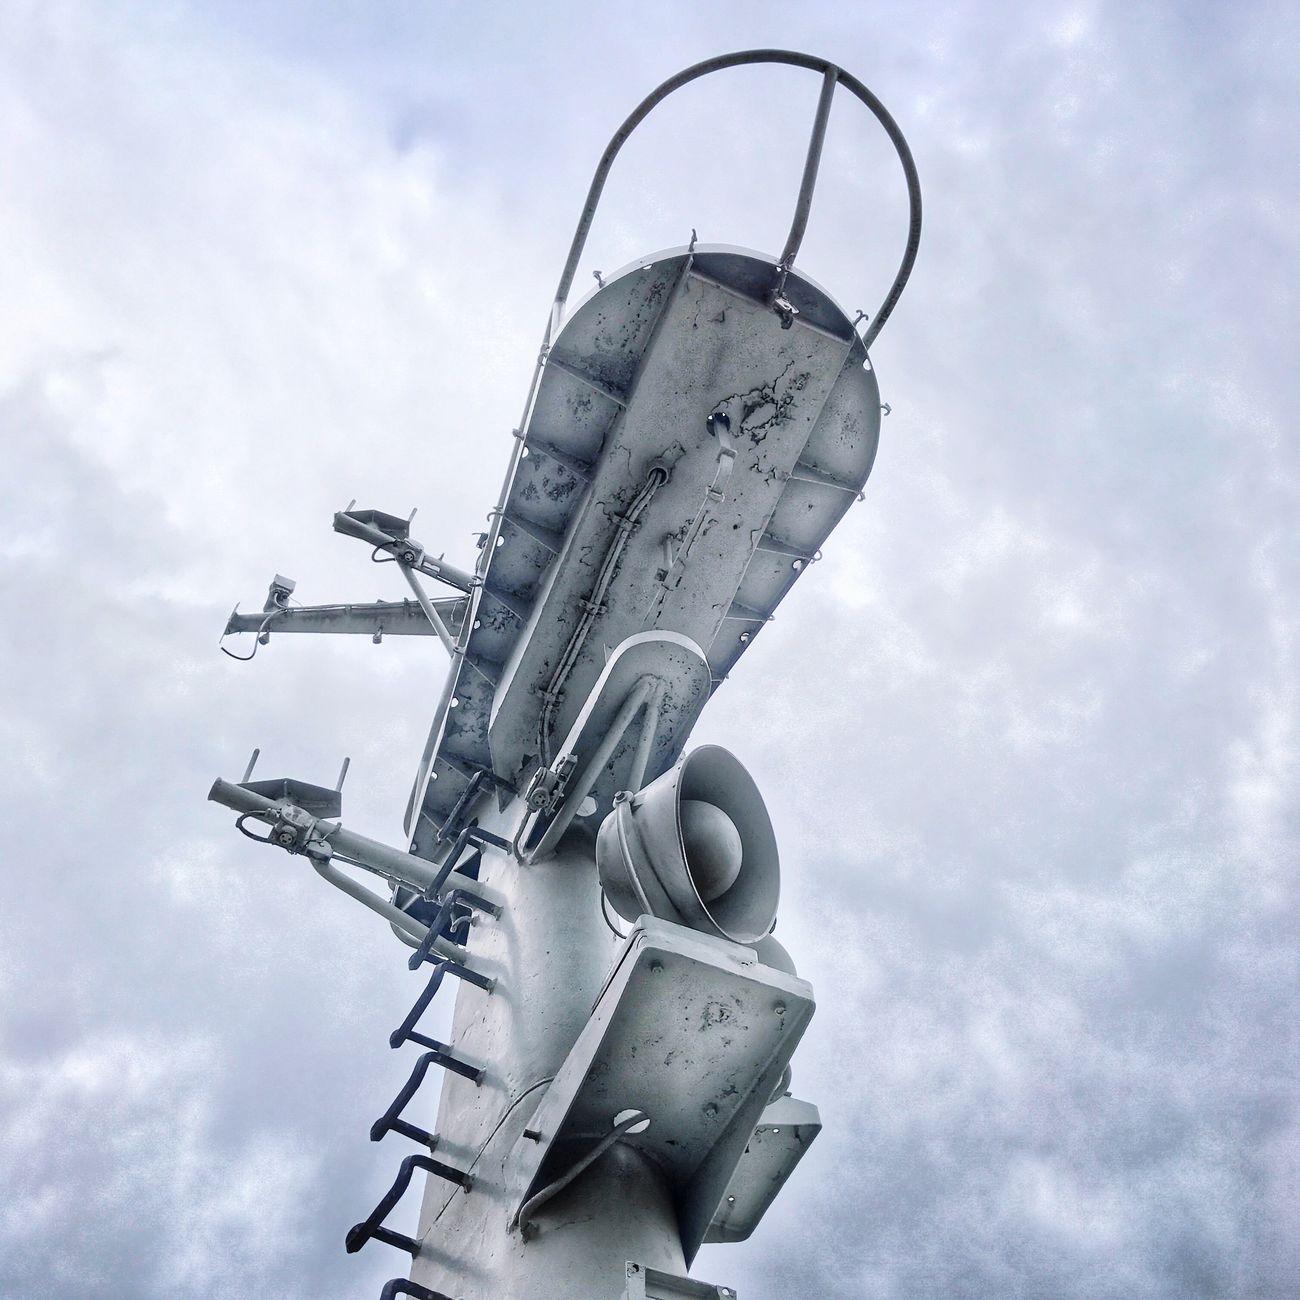 Submarine Mast Periscope Sky Low Angle View Cloud - Sky No People Outdoors Air Vehicle Day Nautical Nautical Vessel Navy Moody Sky Moody Grey Grey Sky